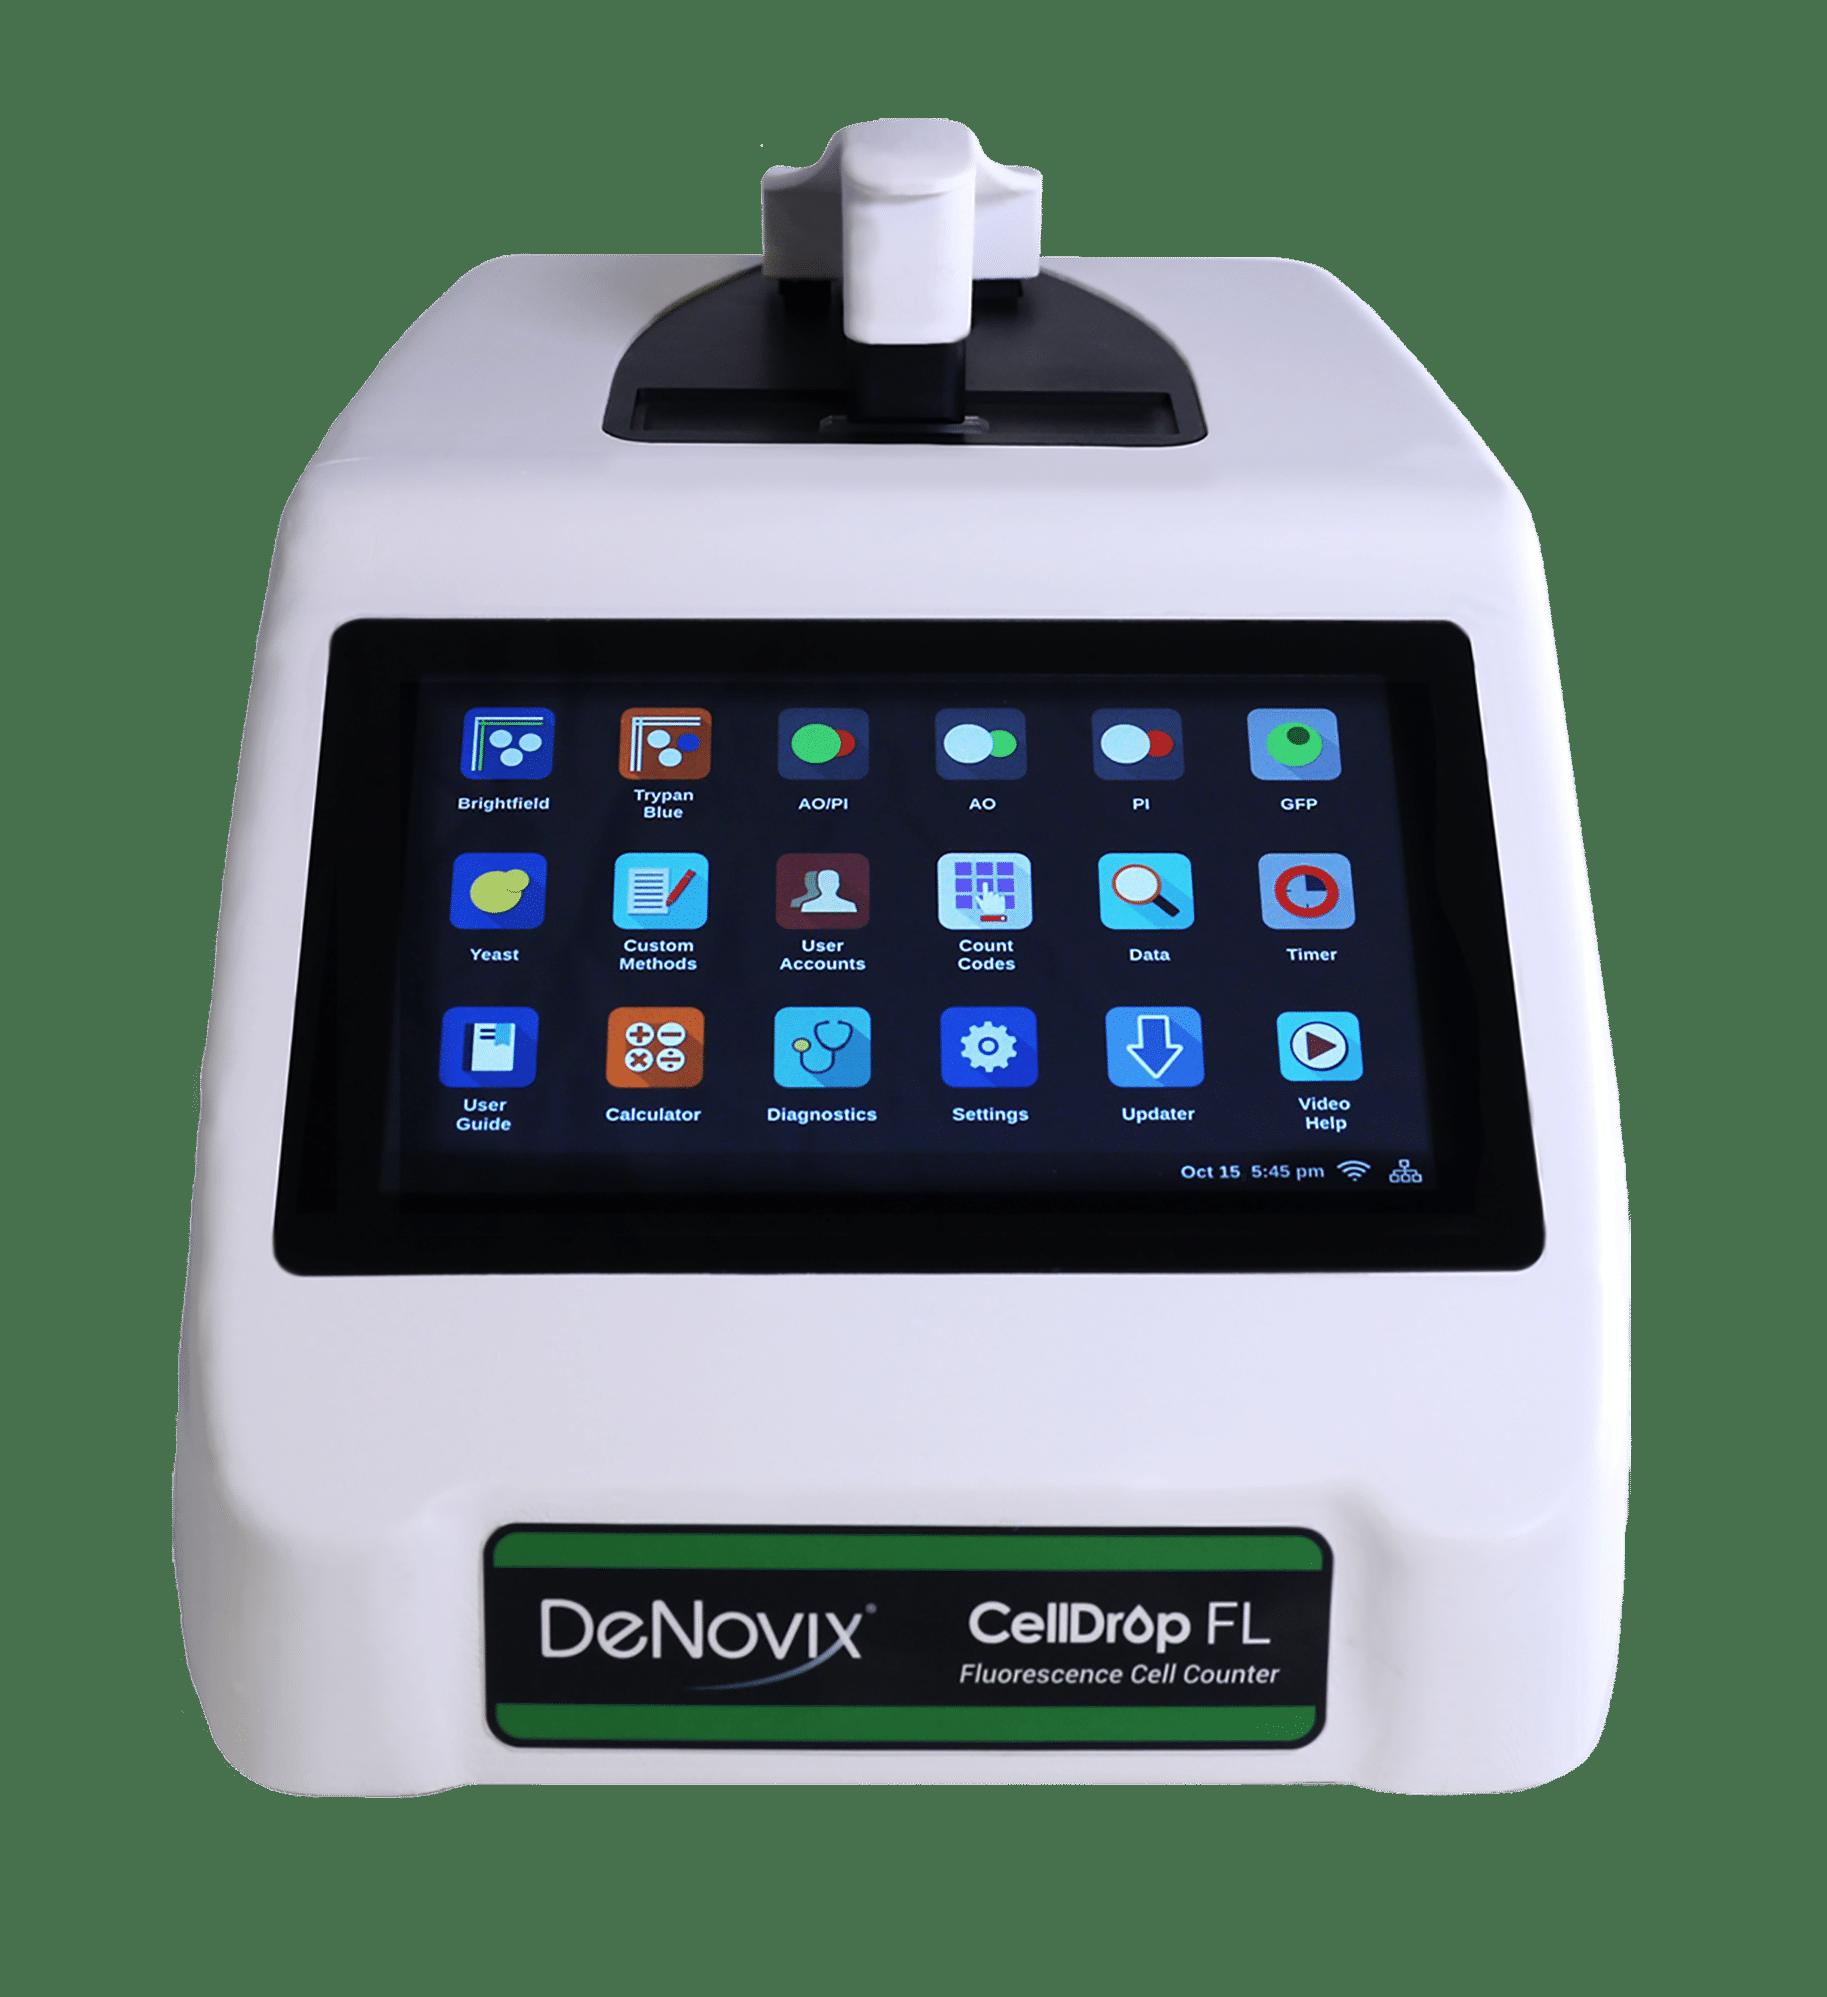 CellDrop FL